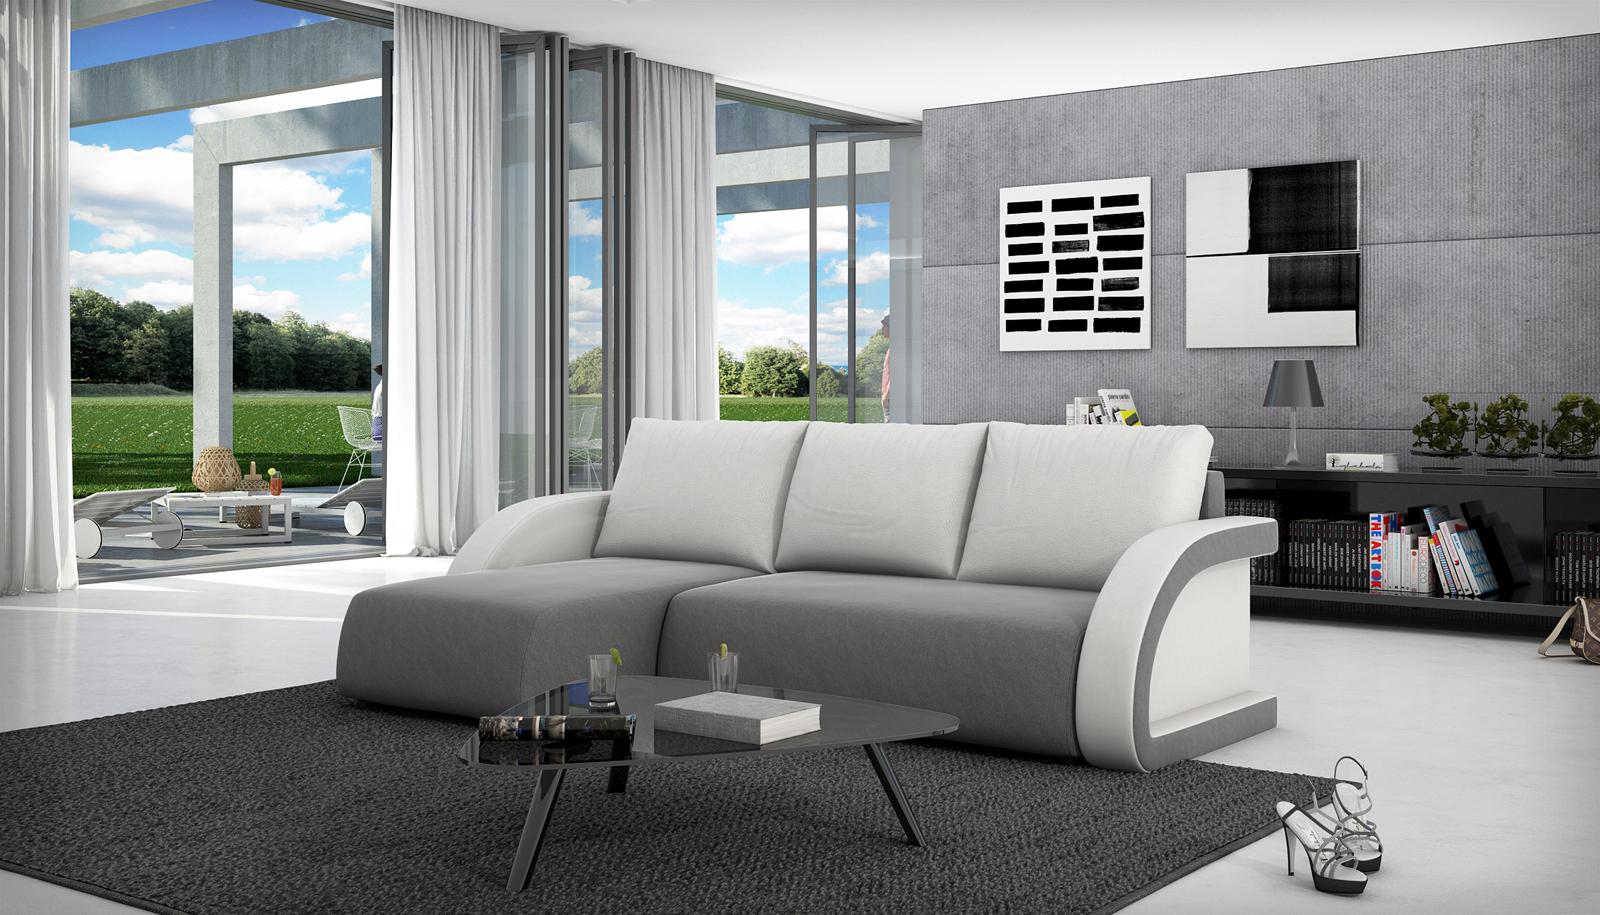 sam schlafsofa grau wei ecksofa azulia 145 x 236 cm auf lager. Black Bedroom Furniture Sets. Home Design Ideas